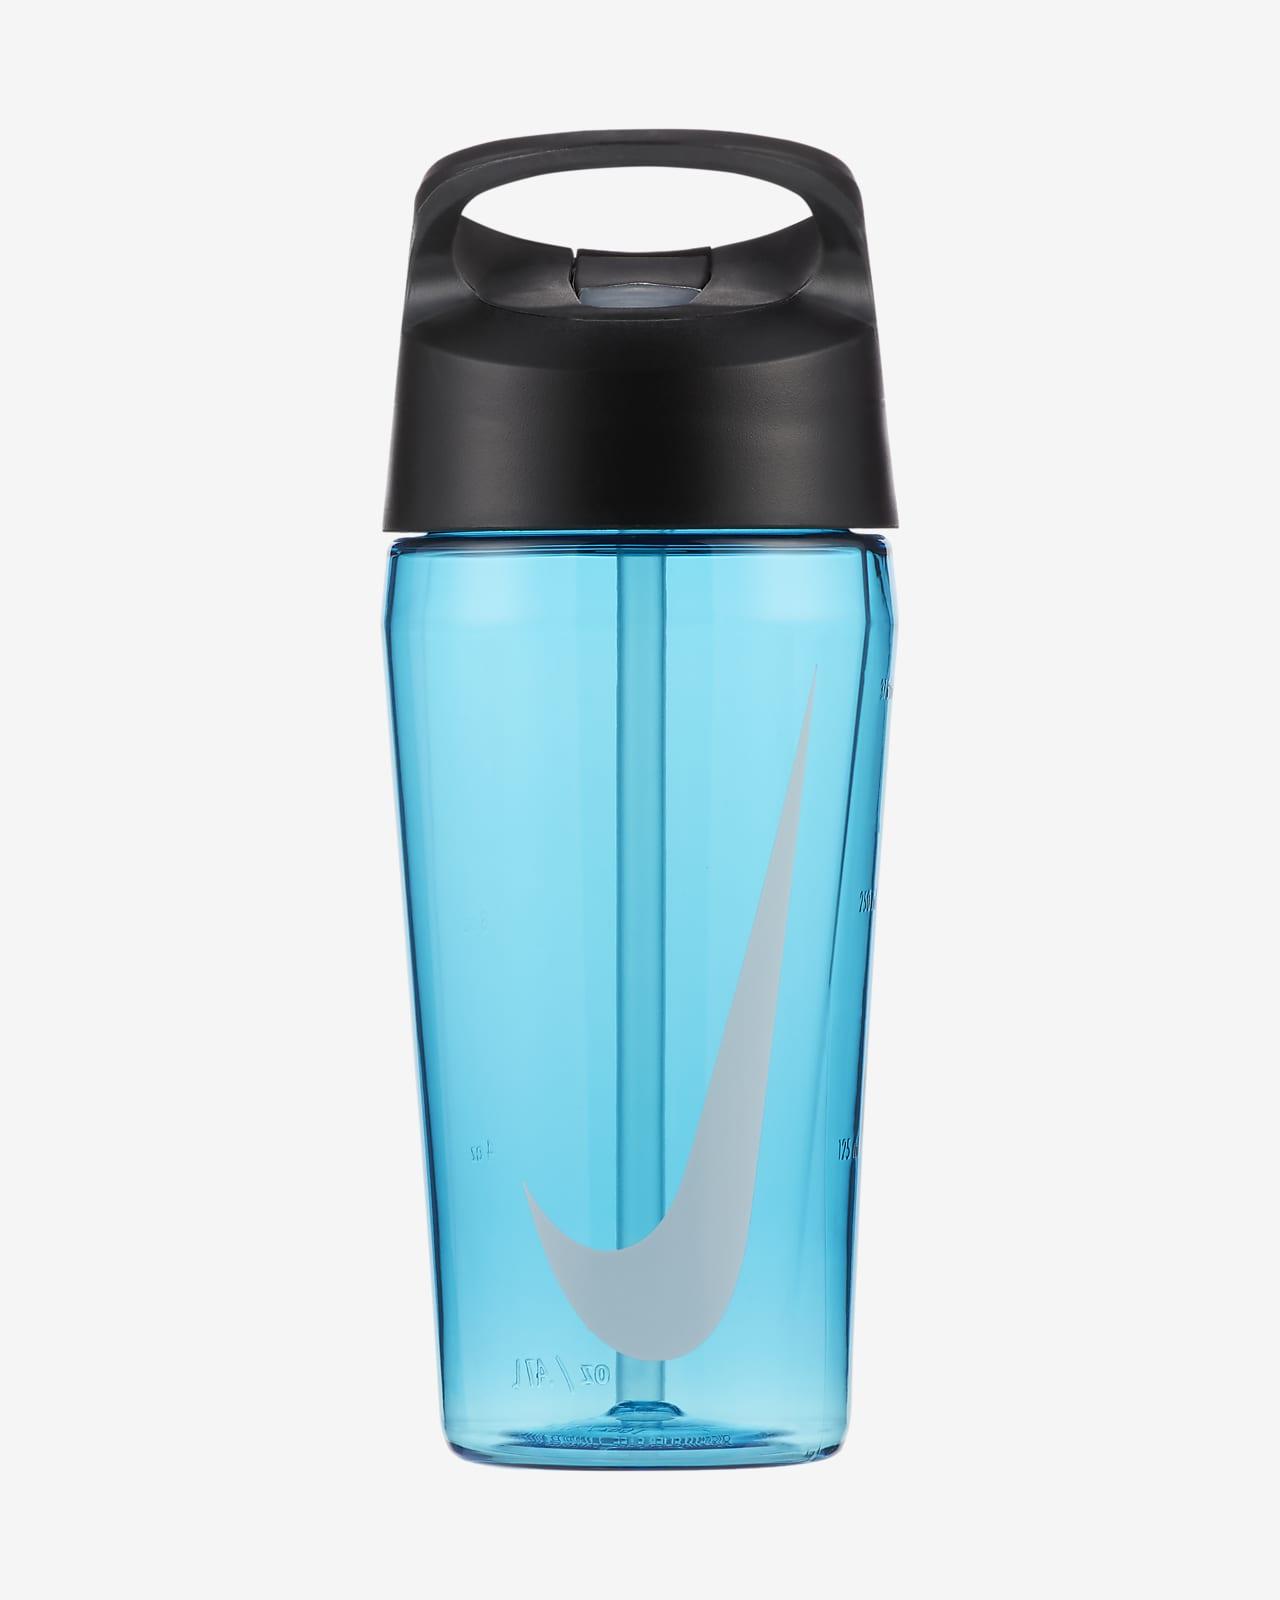 Garrafa de água Nike 16oz TR HyperCharge Straw